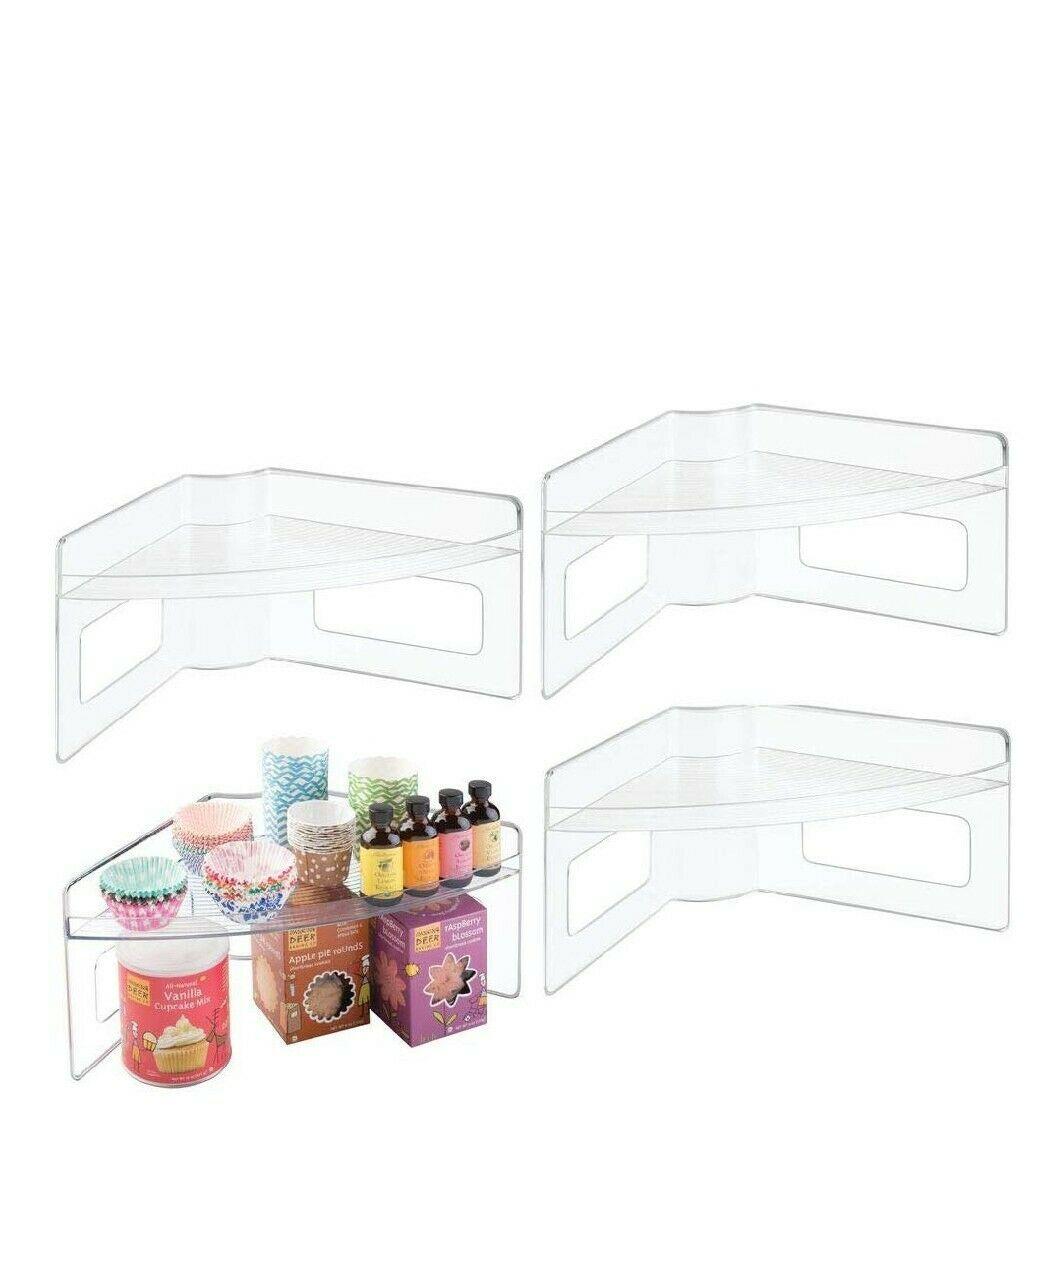 mDesign Plastic Kitchen Cabinet Lazy Susan Food Storage Organizer Raised Shelf - 1